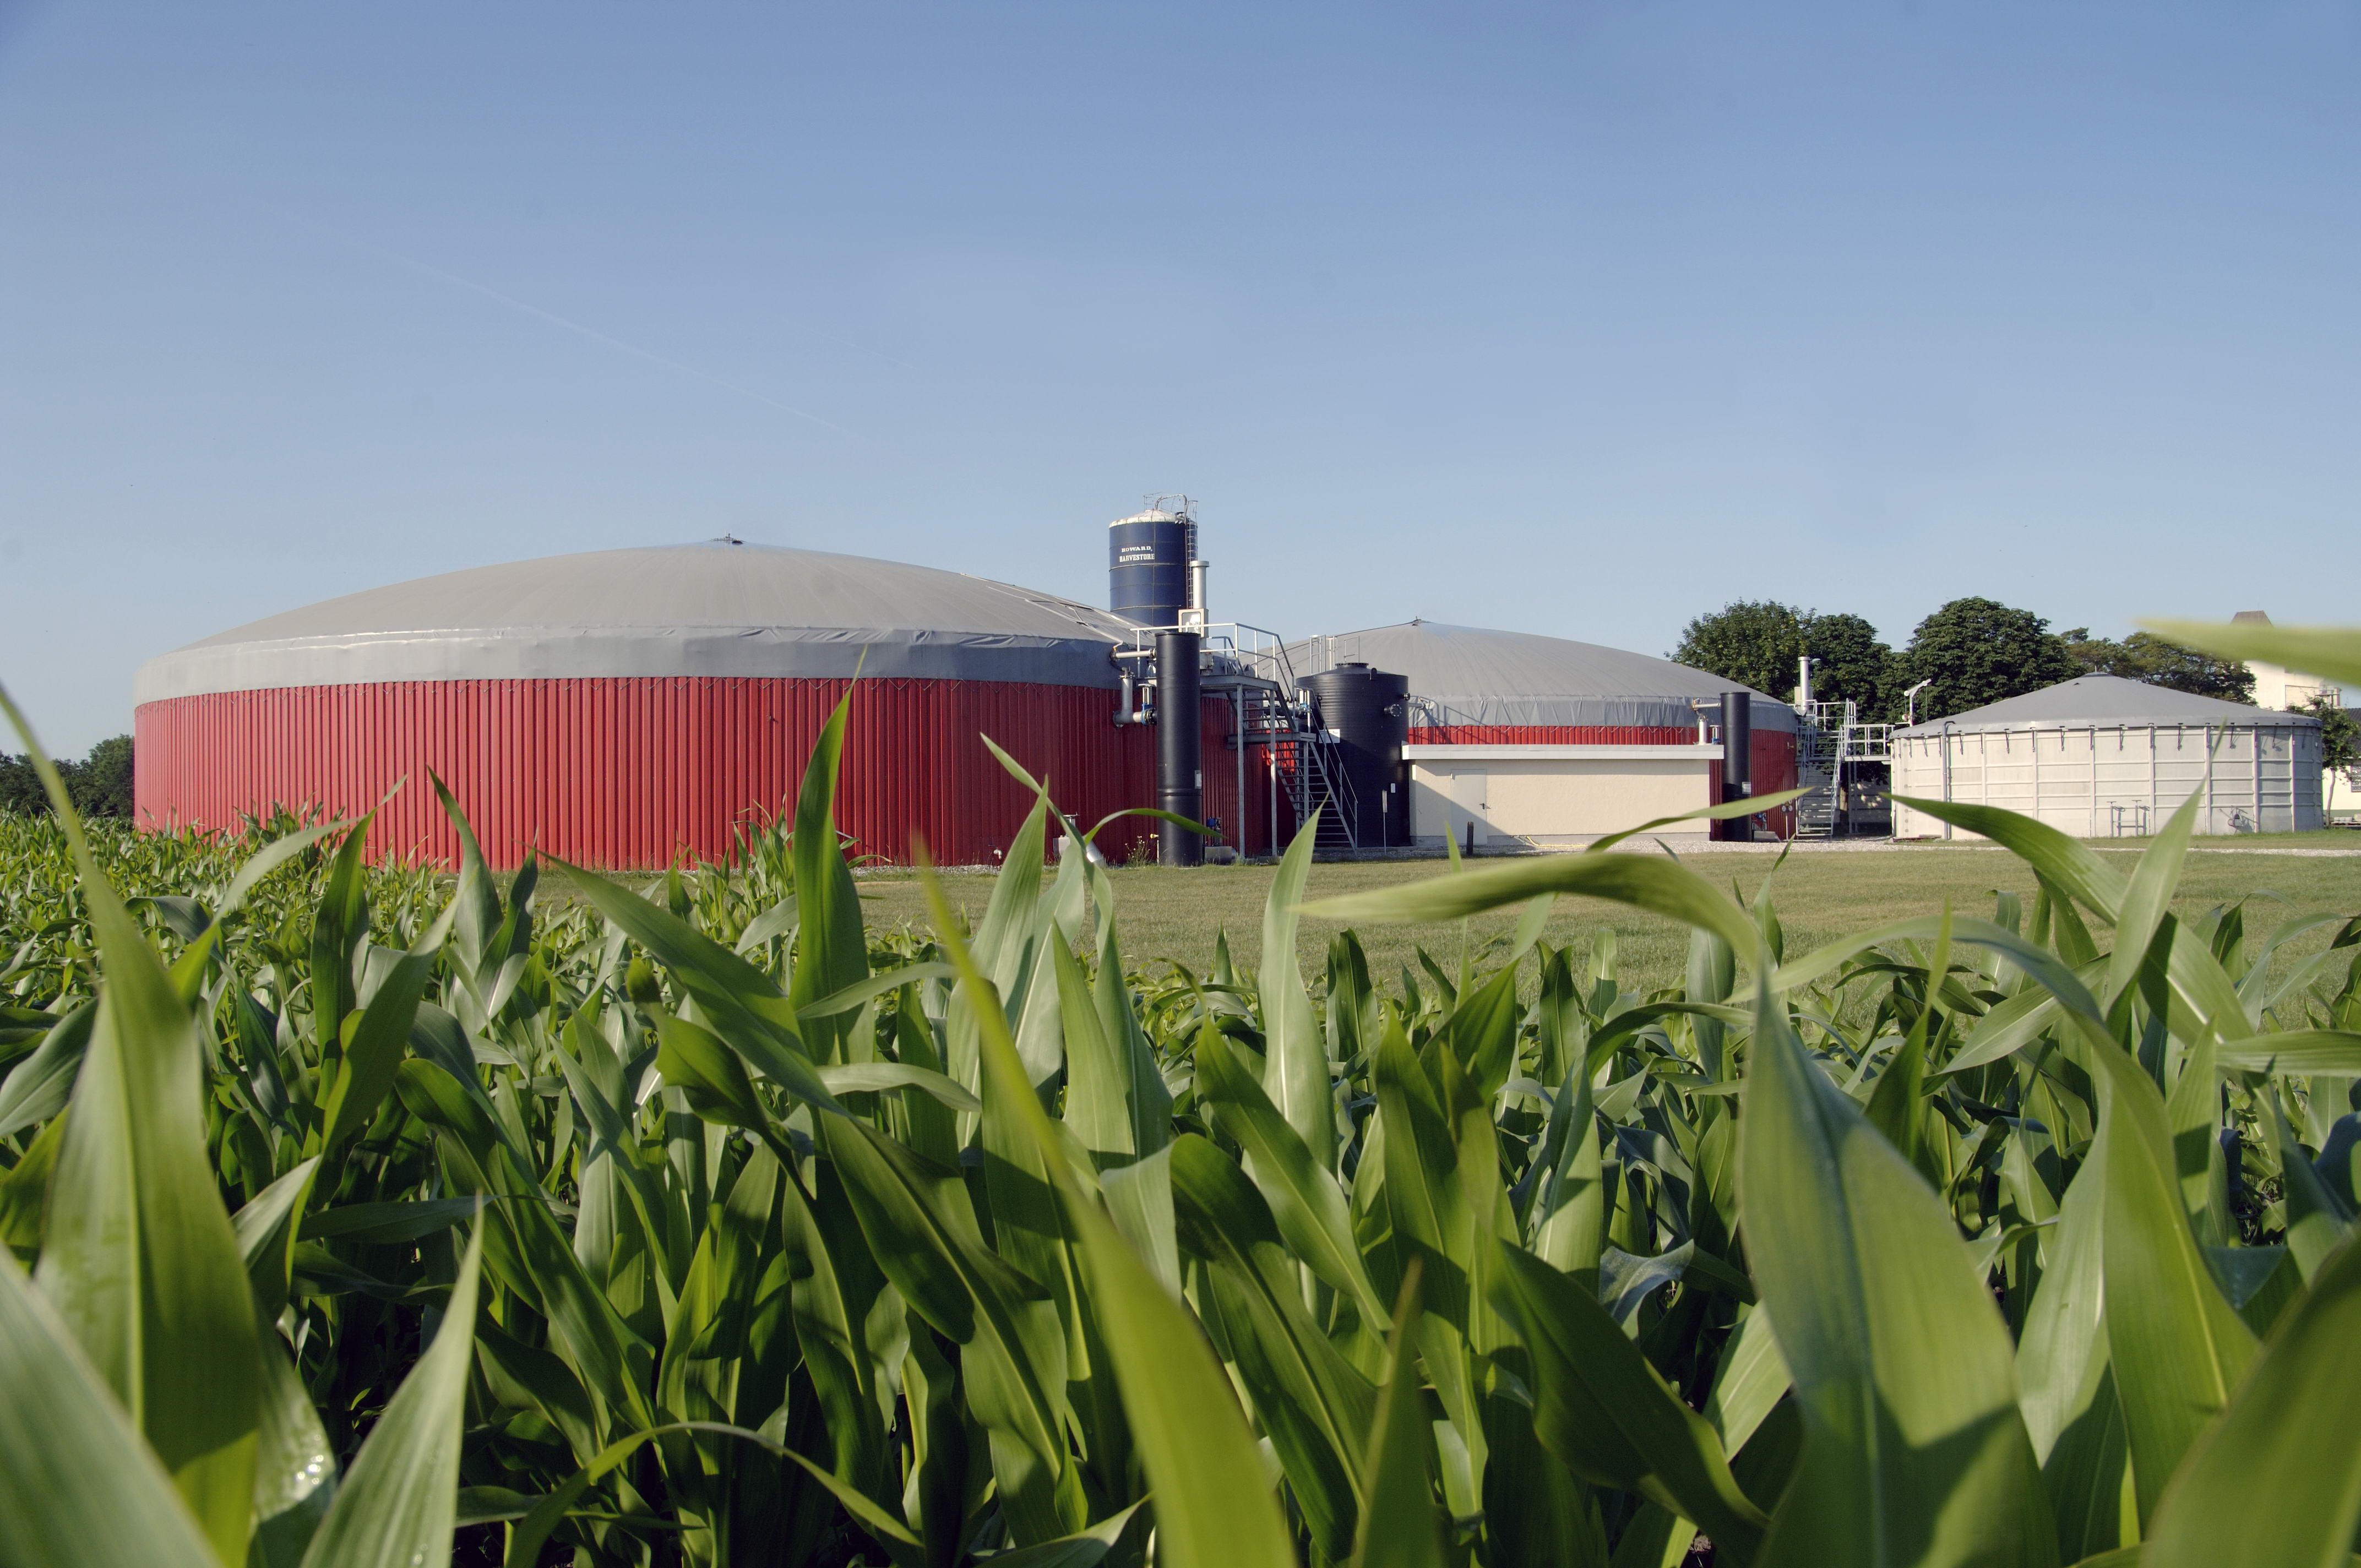 An EnviTec Biogas Anaerobic Digestion Plant